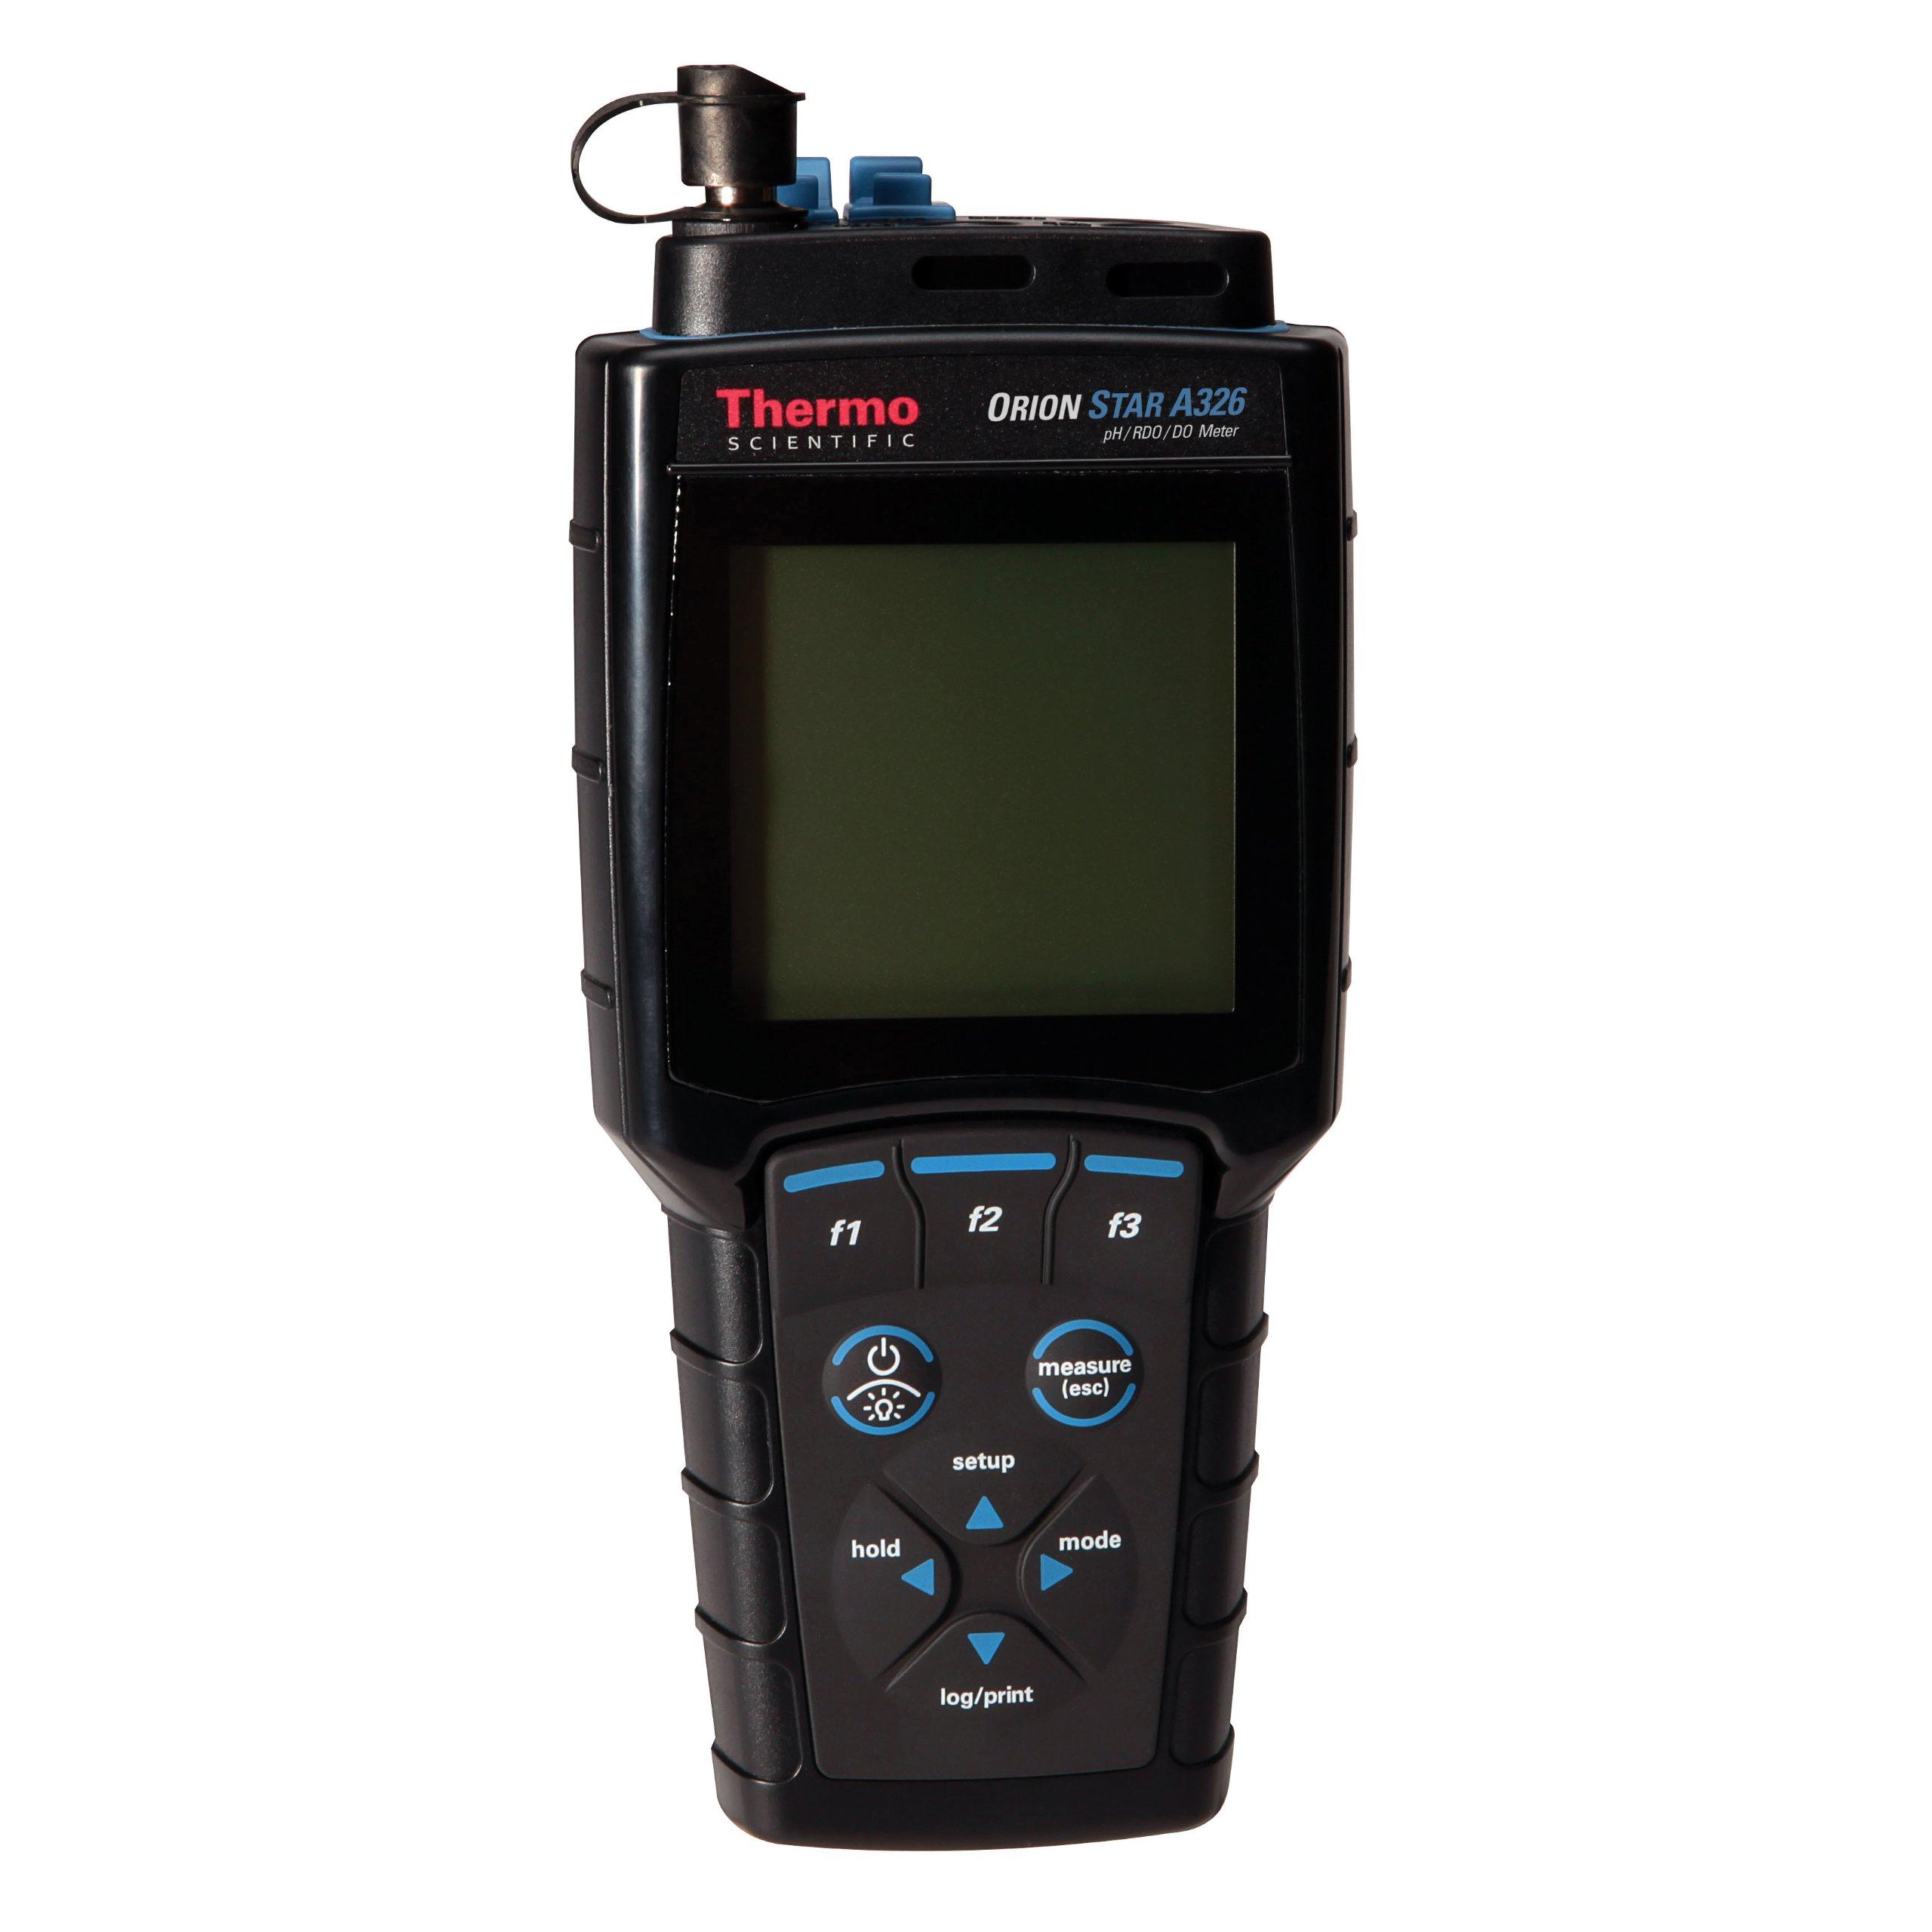 Thermo Scientific Orion Star A326 Portable pH/mv/RDO/DO/Temperature Multiparameter Meter Kit